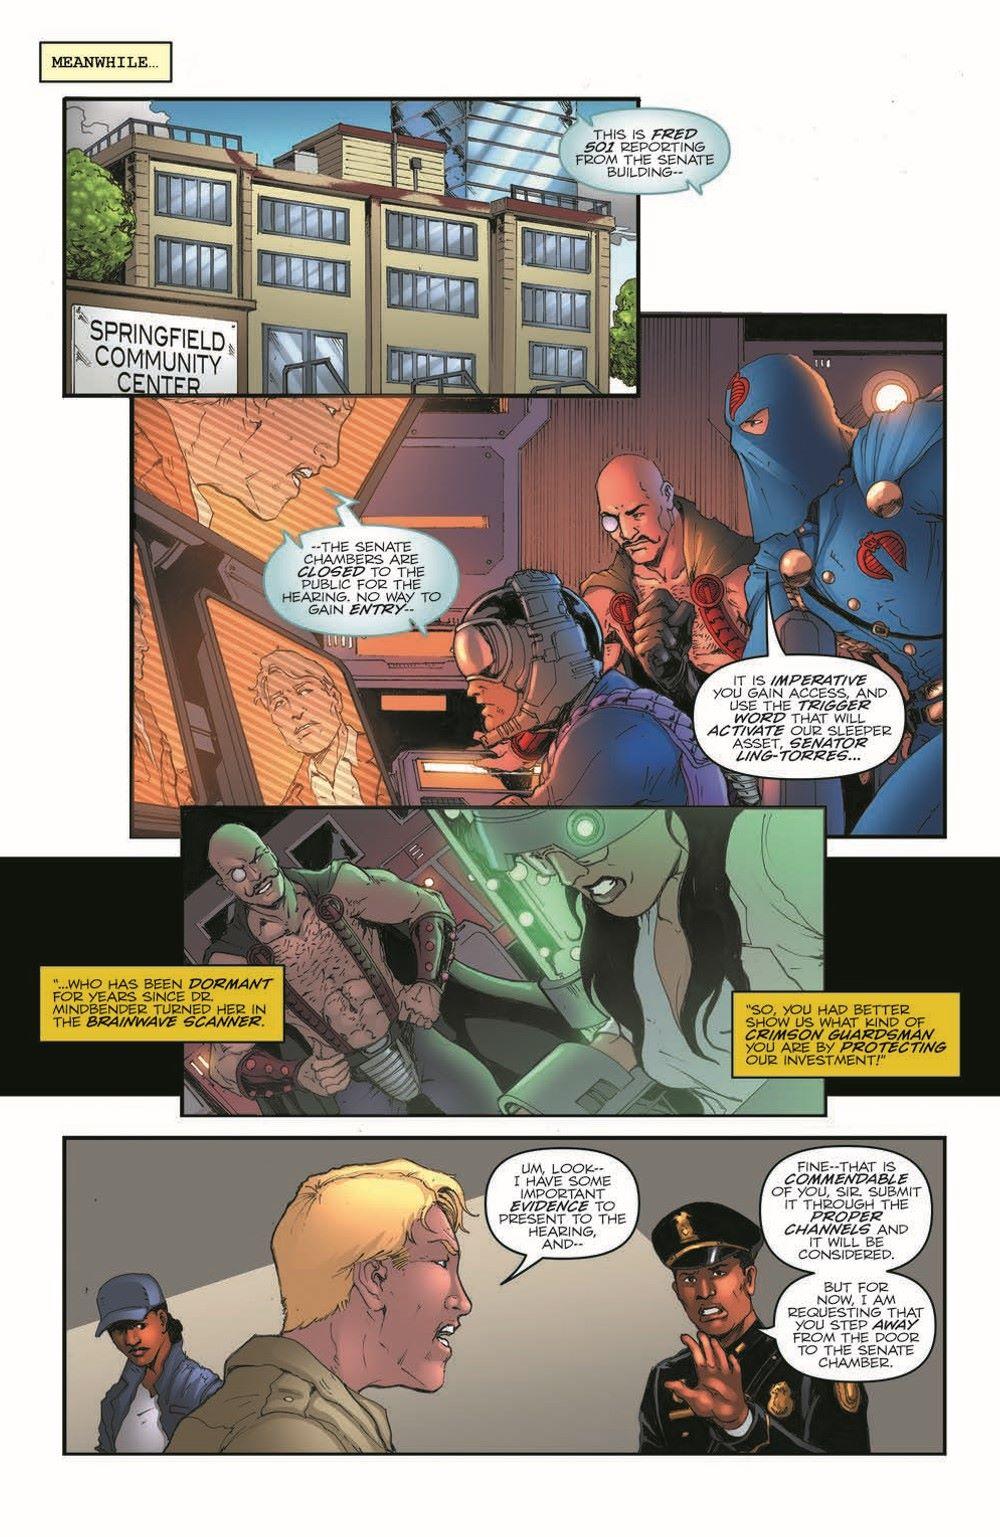 GIJoeRAH282-pr-6 ComicList Previews: G.I. JOE A REAL AMERICAN HERO #282